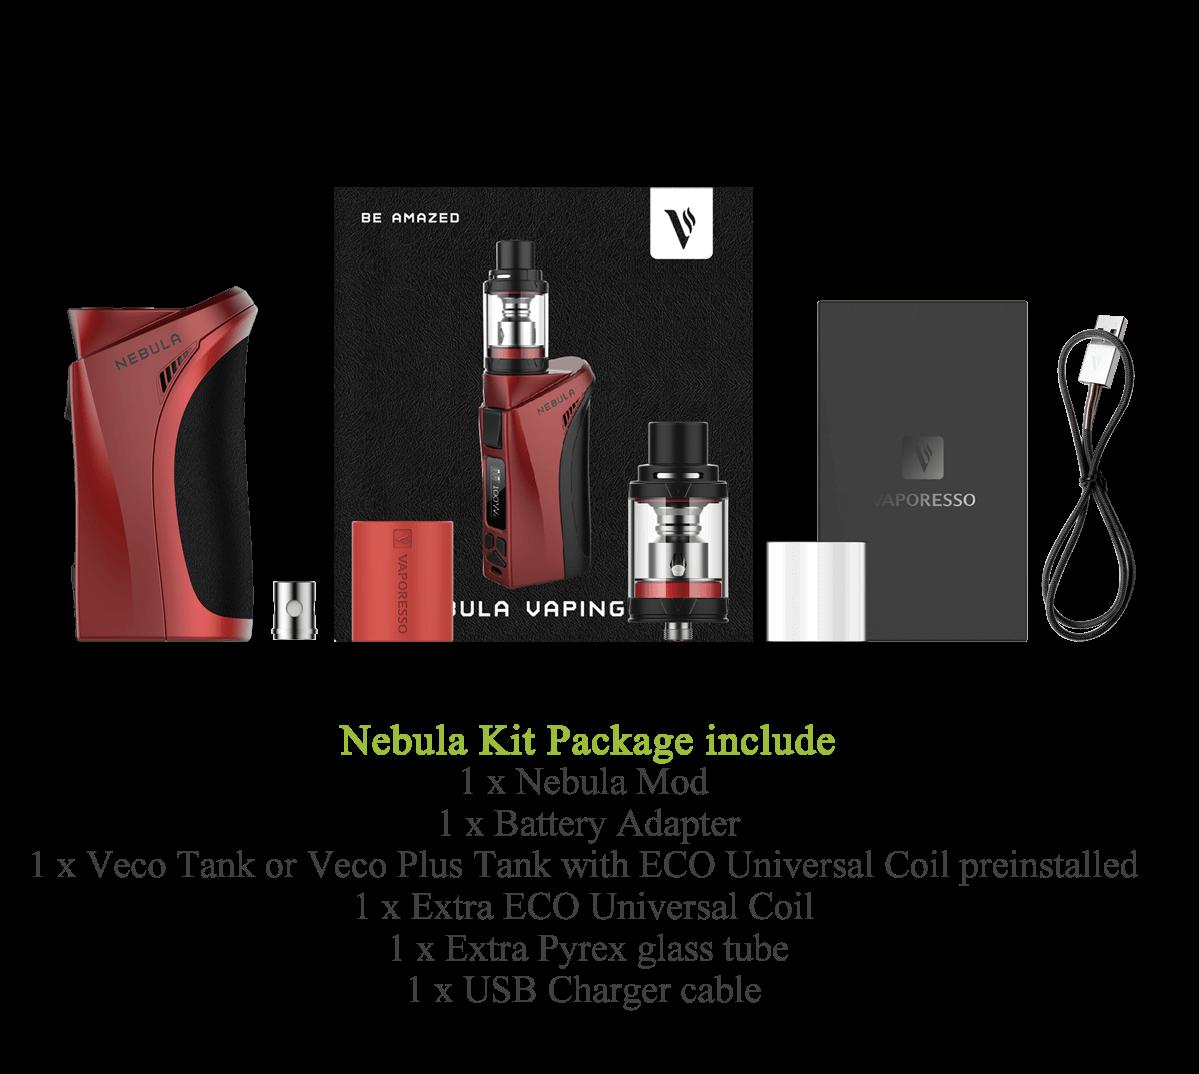 nebula_kit_package_vaporesso.png